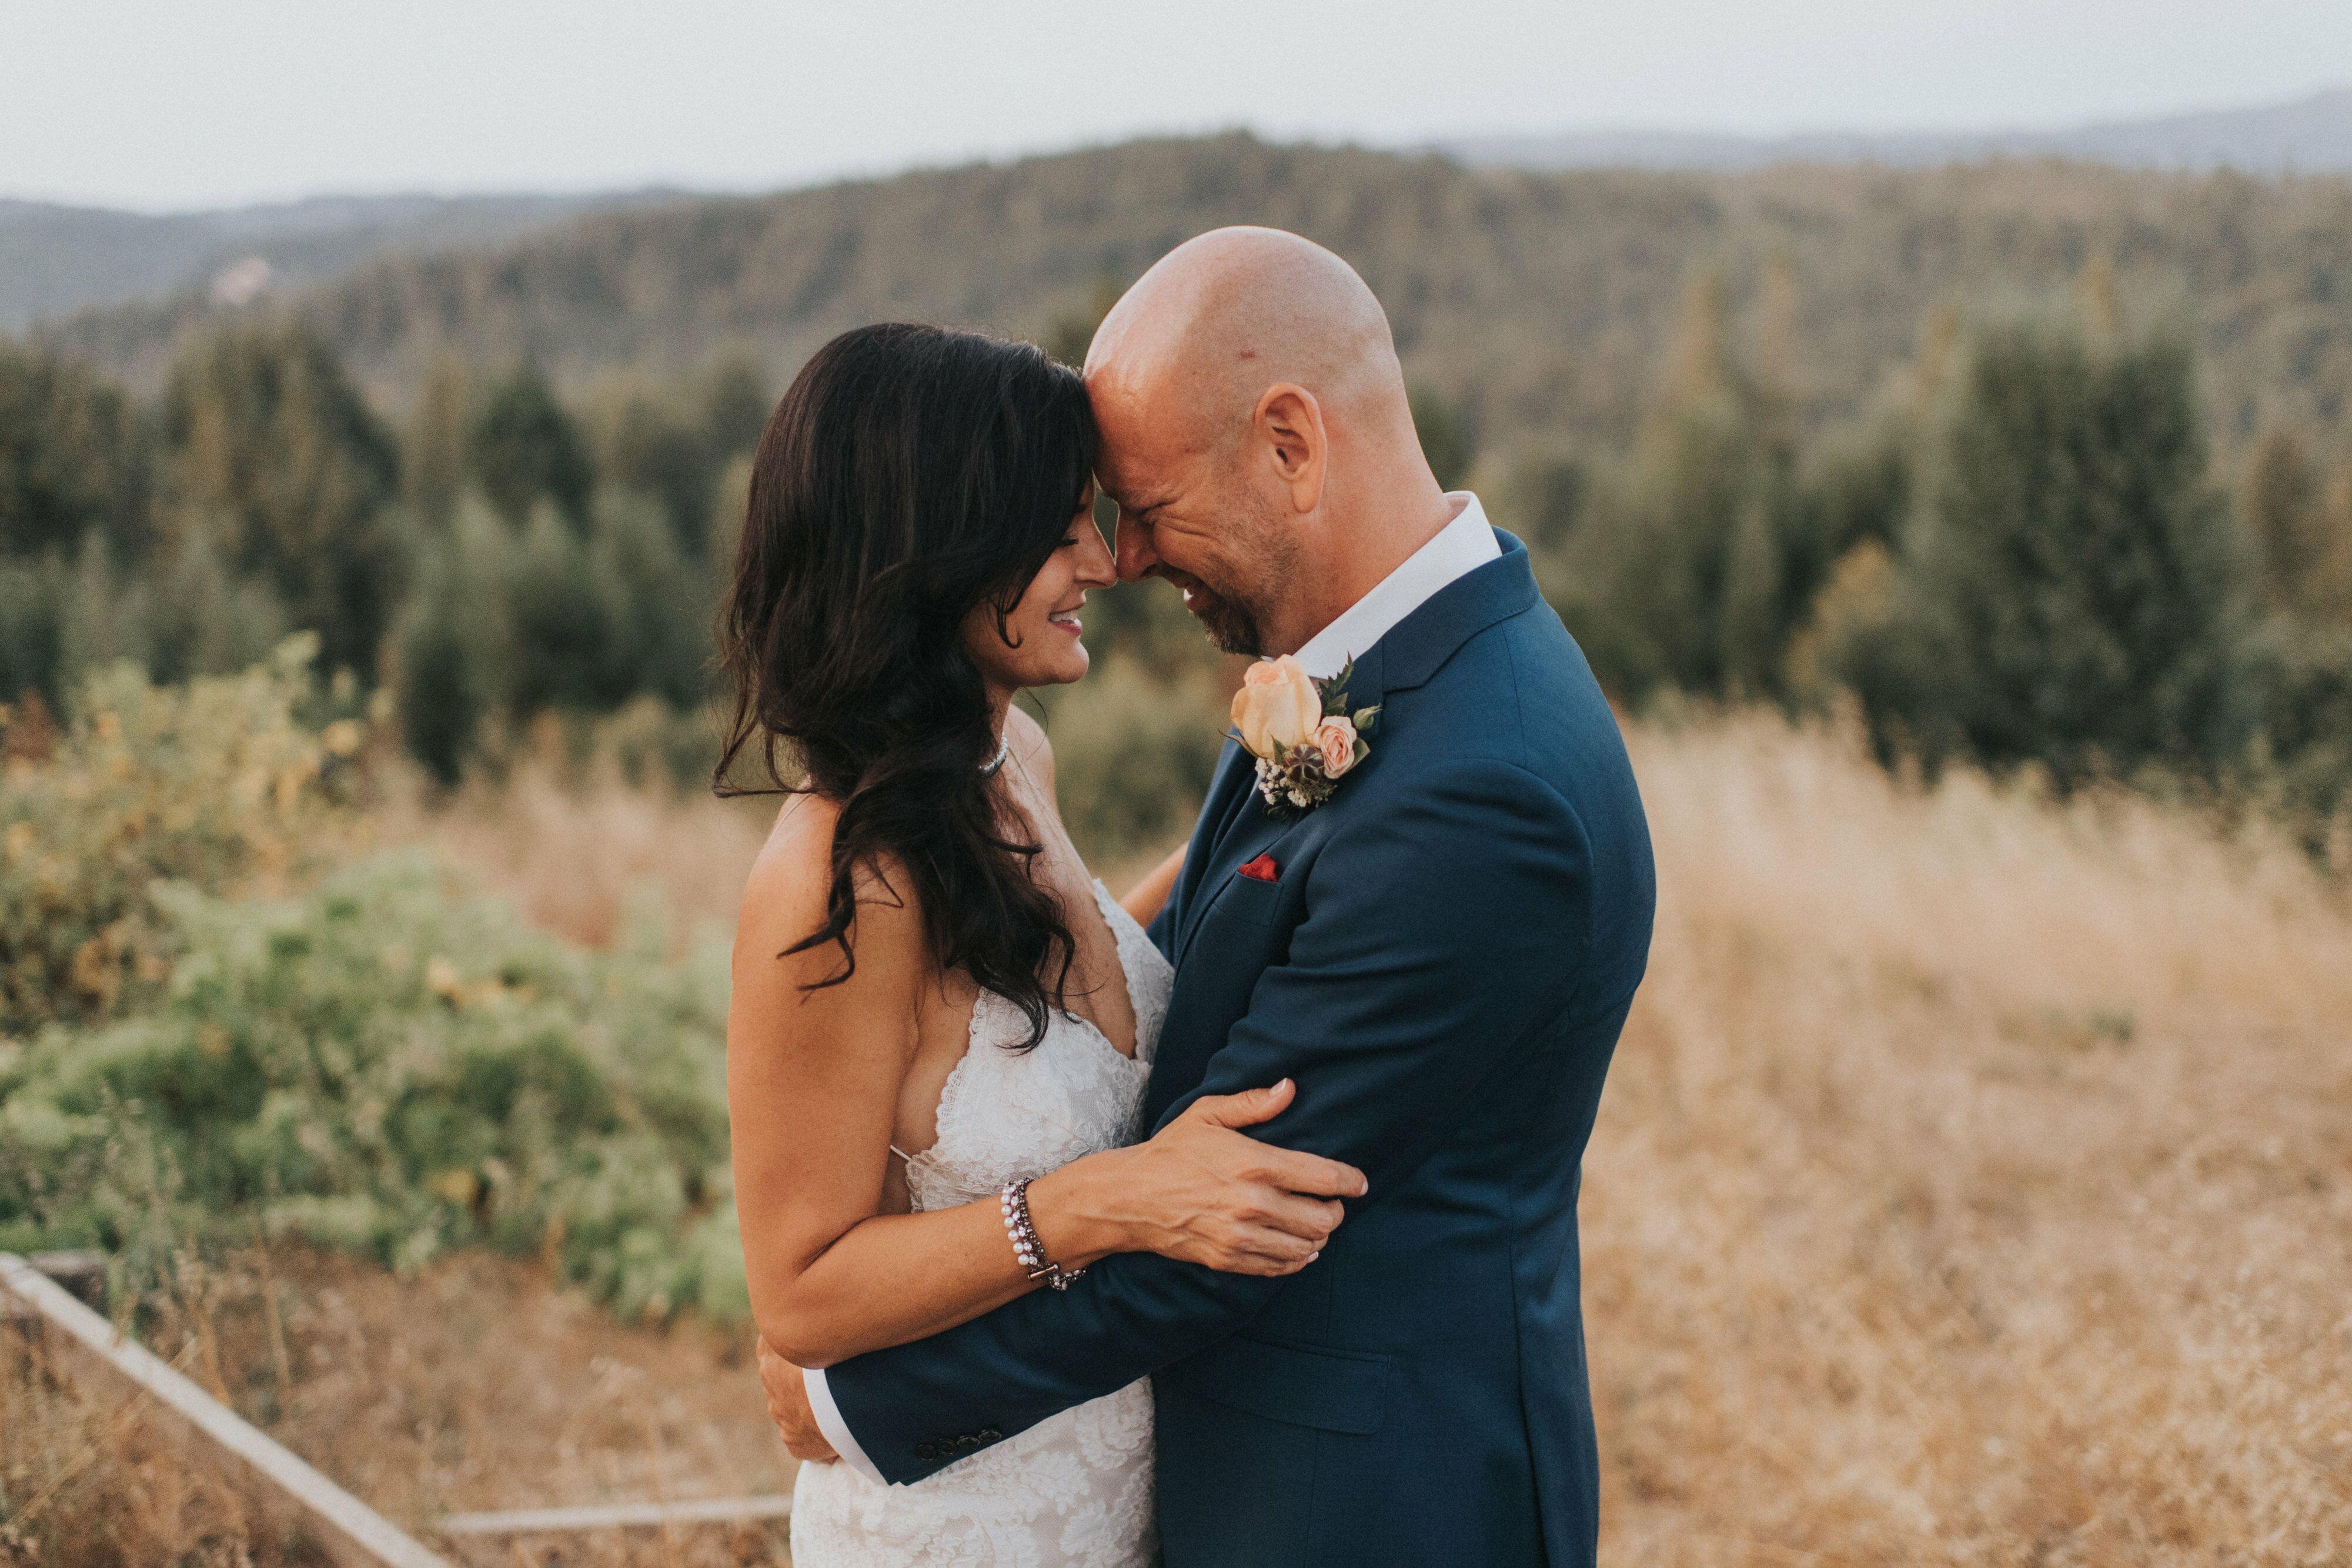 Wedding Venues In Santa Cruz Ca The Knot